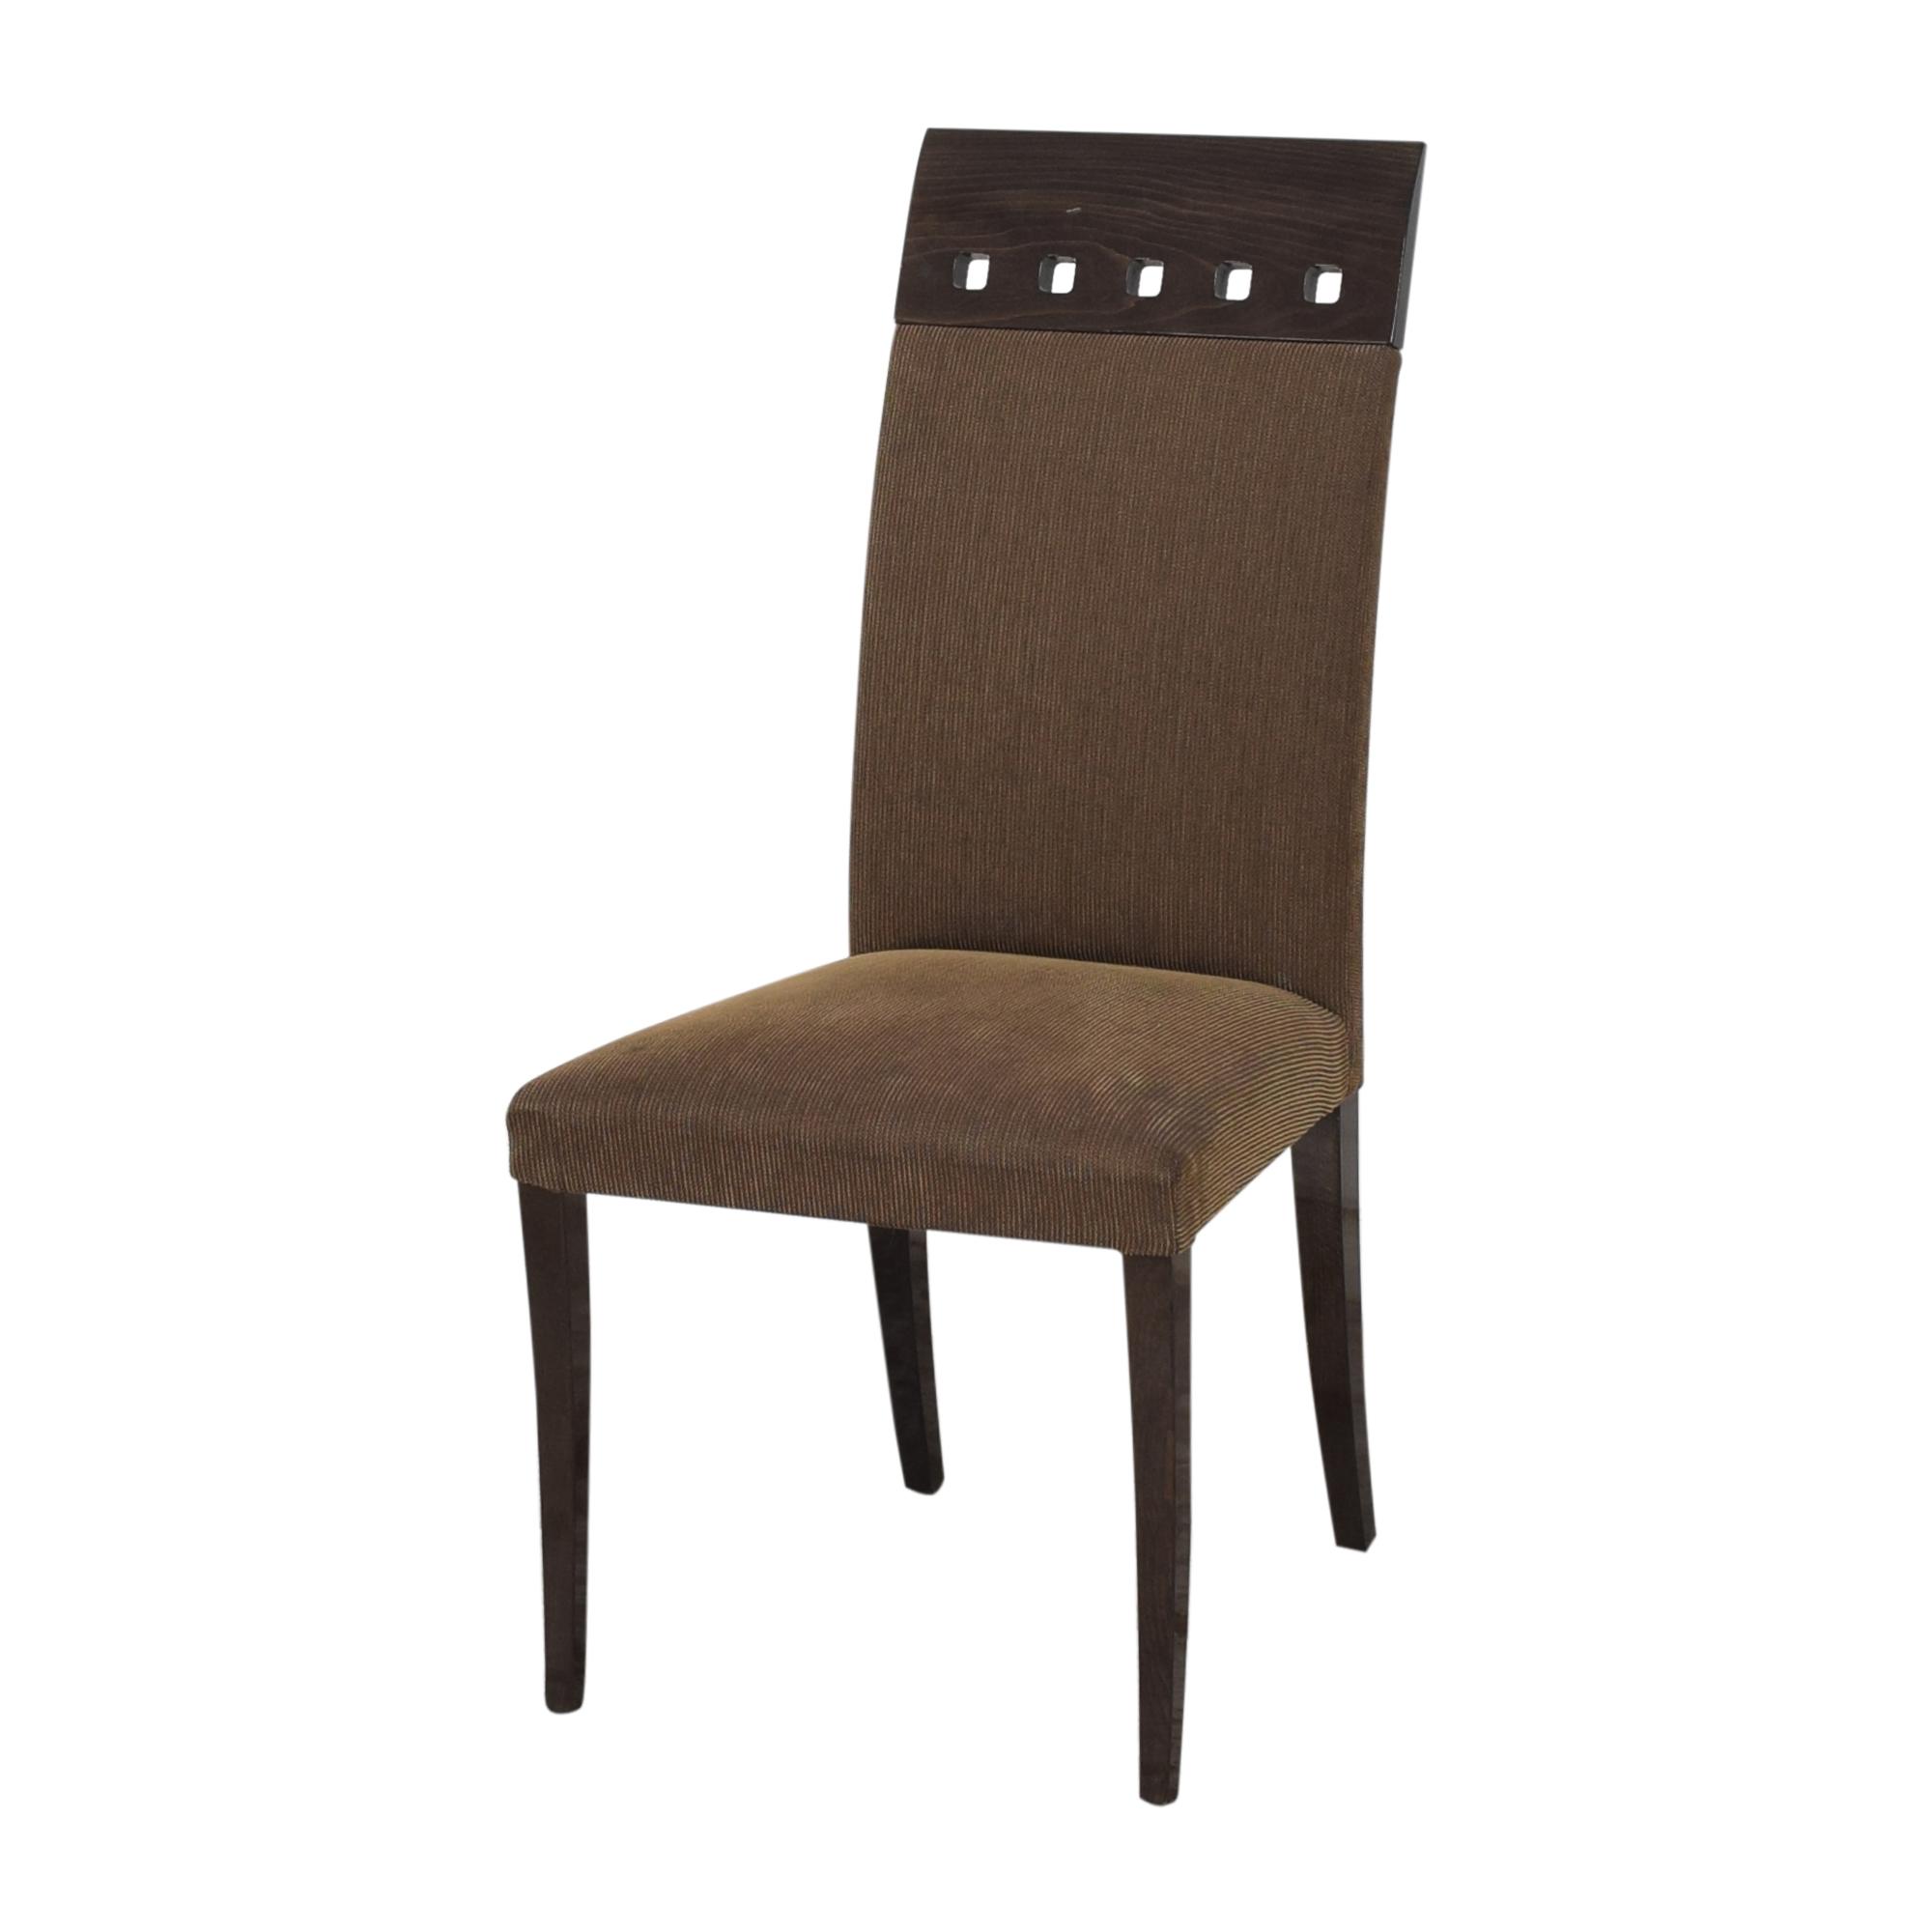 Pietro Costantini Pietro Costantini Waldorf Dining Side Chairs